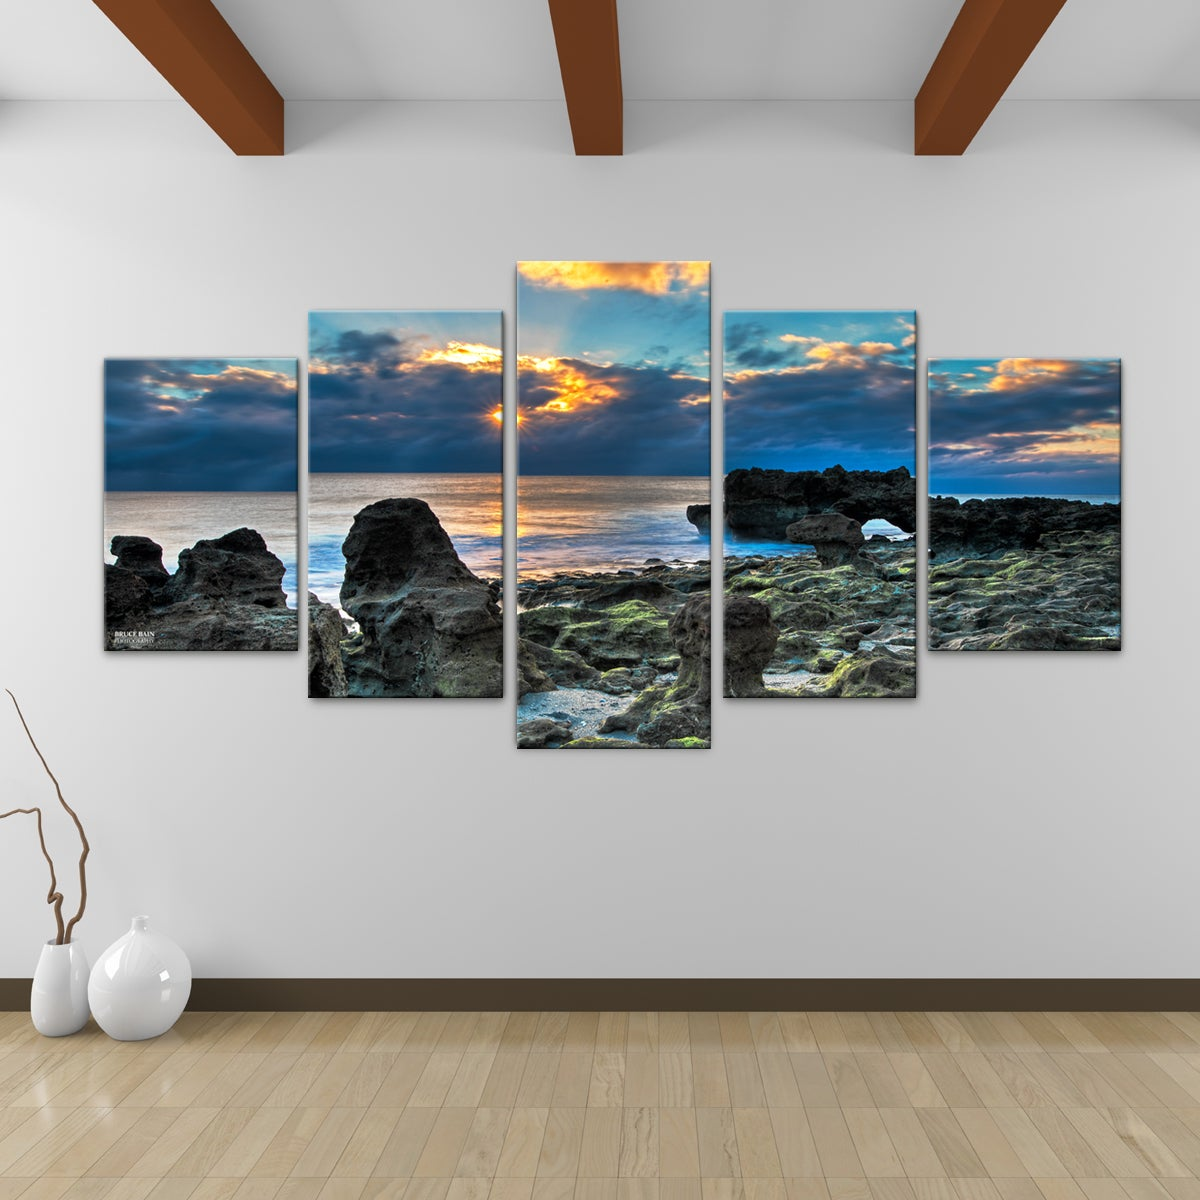 bruce bain 39 sun rise 39 5 piece canvas wall art overstock. Black Bedroom Furniture Sets. Home Design Ideas